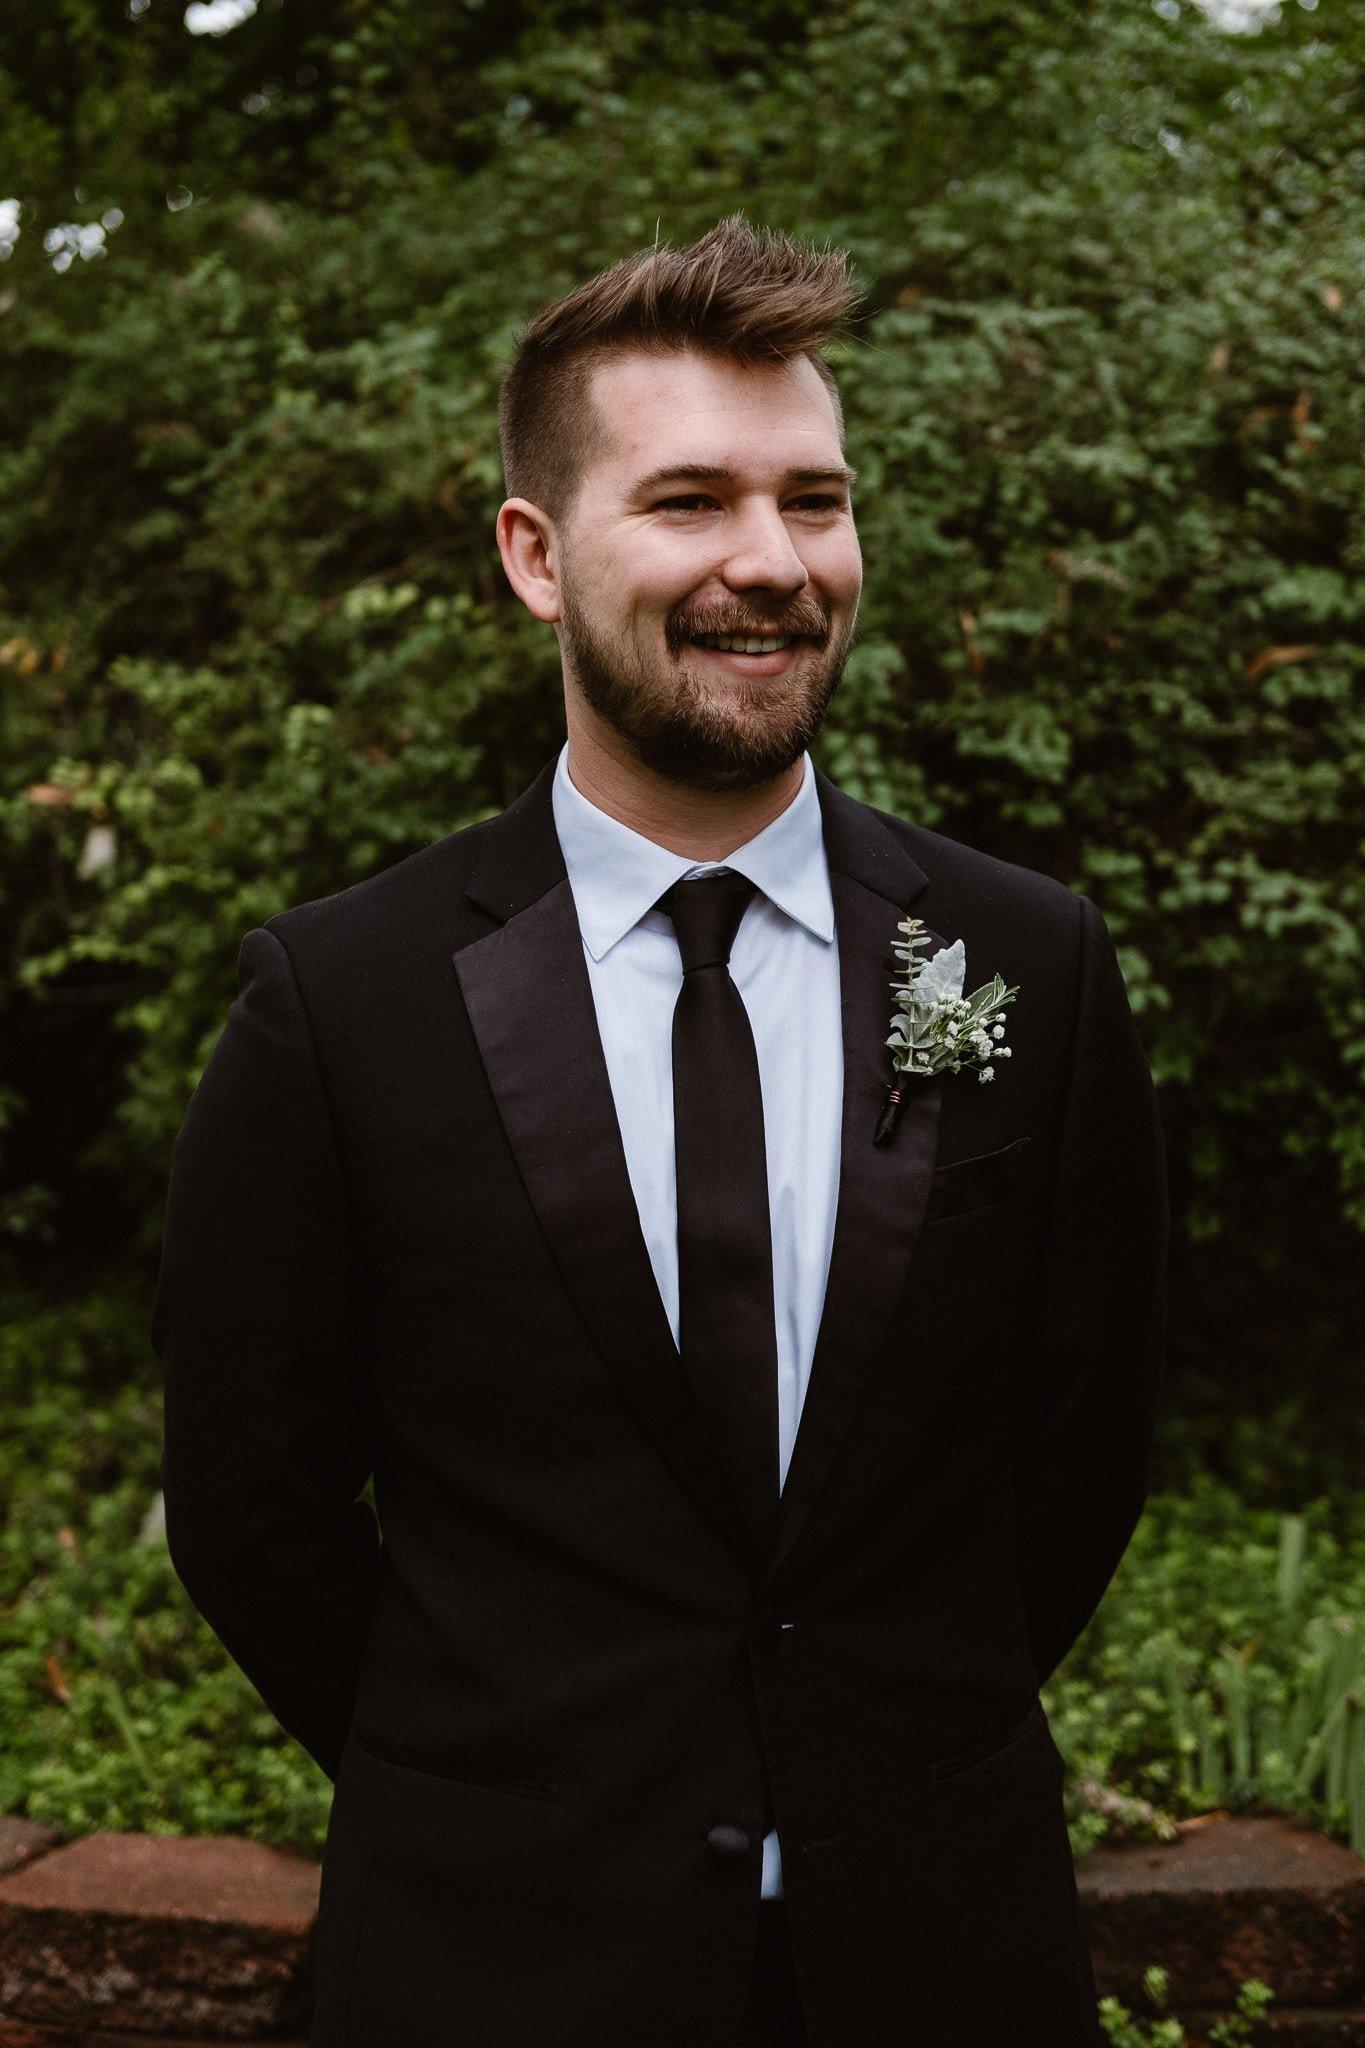 St Vrain Wedding Photographer | Longmont Wedding Photographer | Colorado Winter Wedding Photographer, Colorado industrial chic wedding, groom portrait